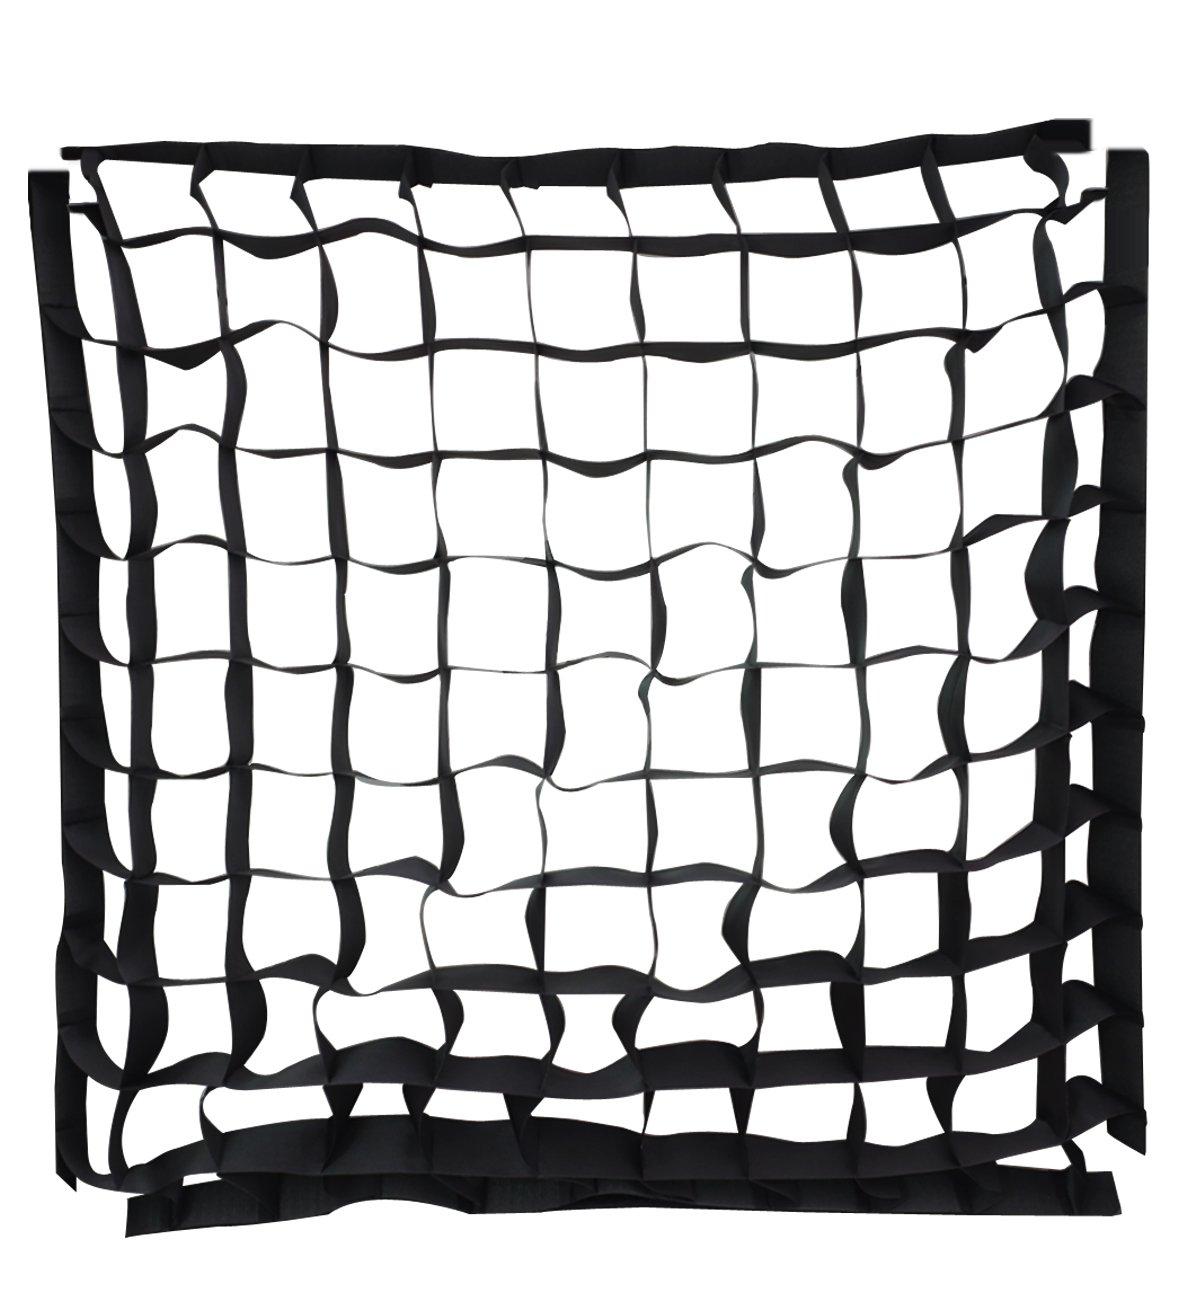 Grid de 40x40cm (solo grid) marca Godox